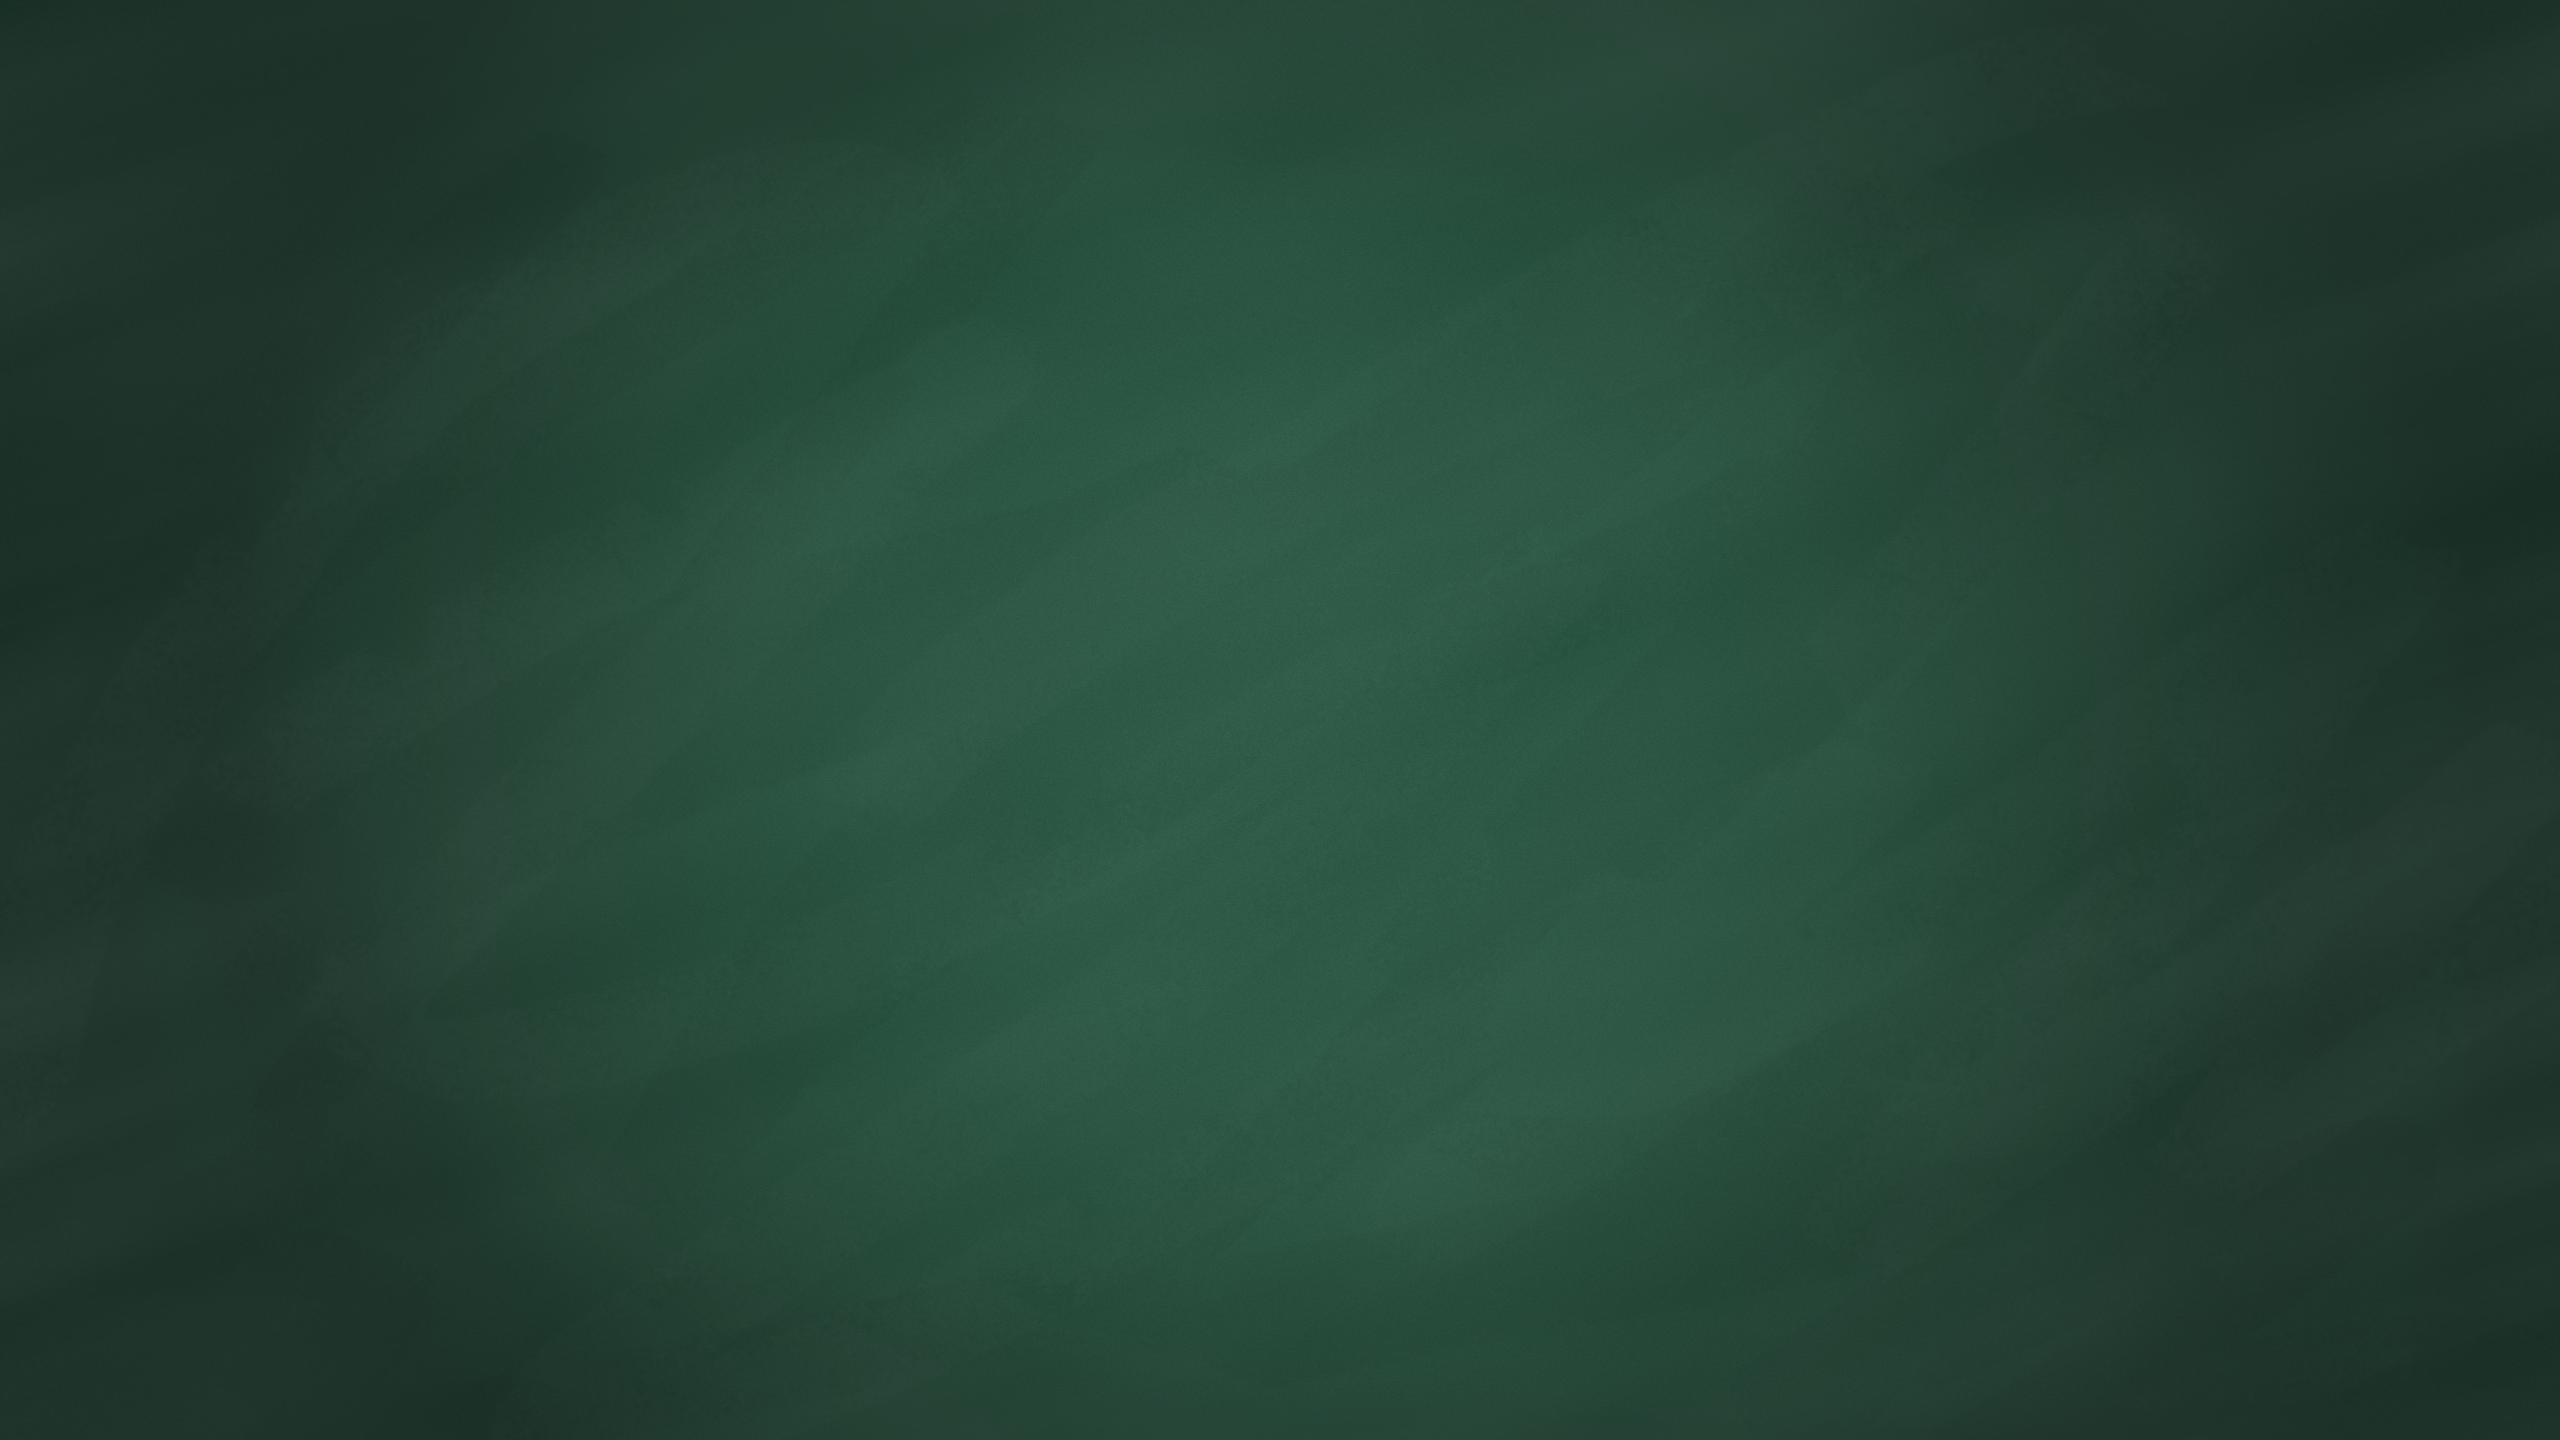 download mathematics chalkboards wallpaper - photo #14